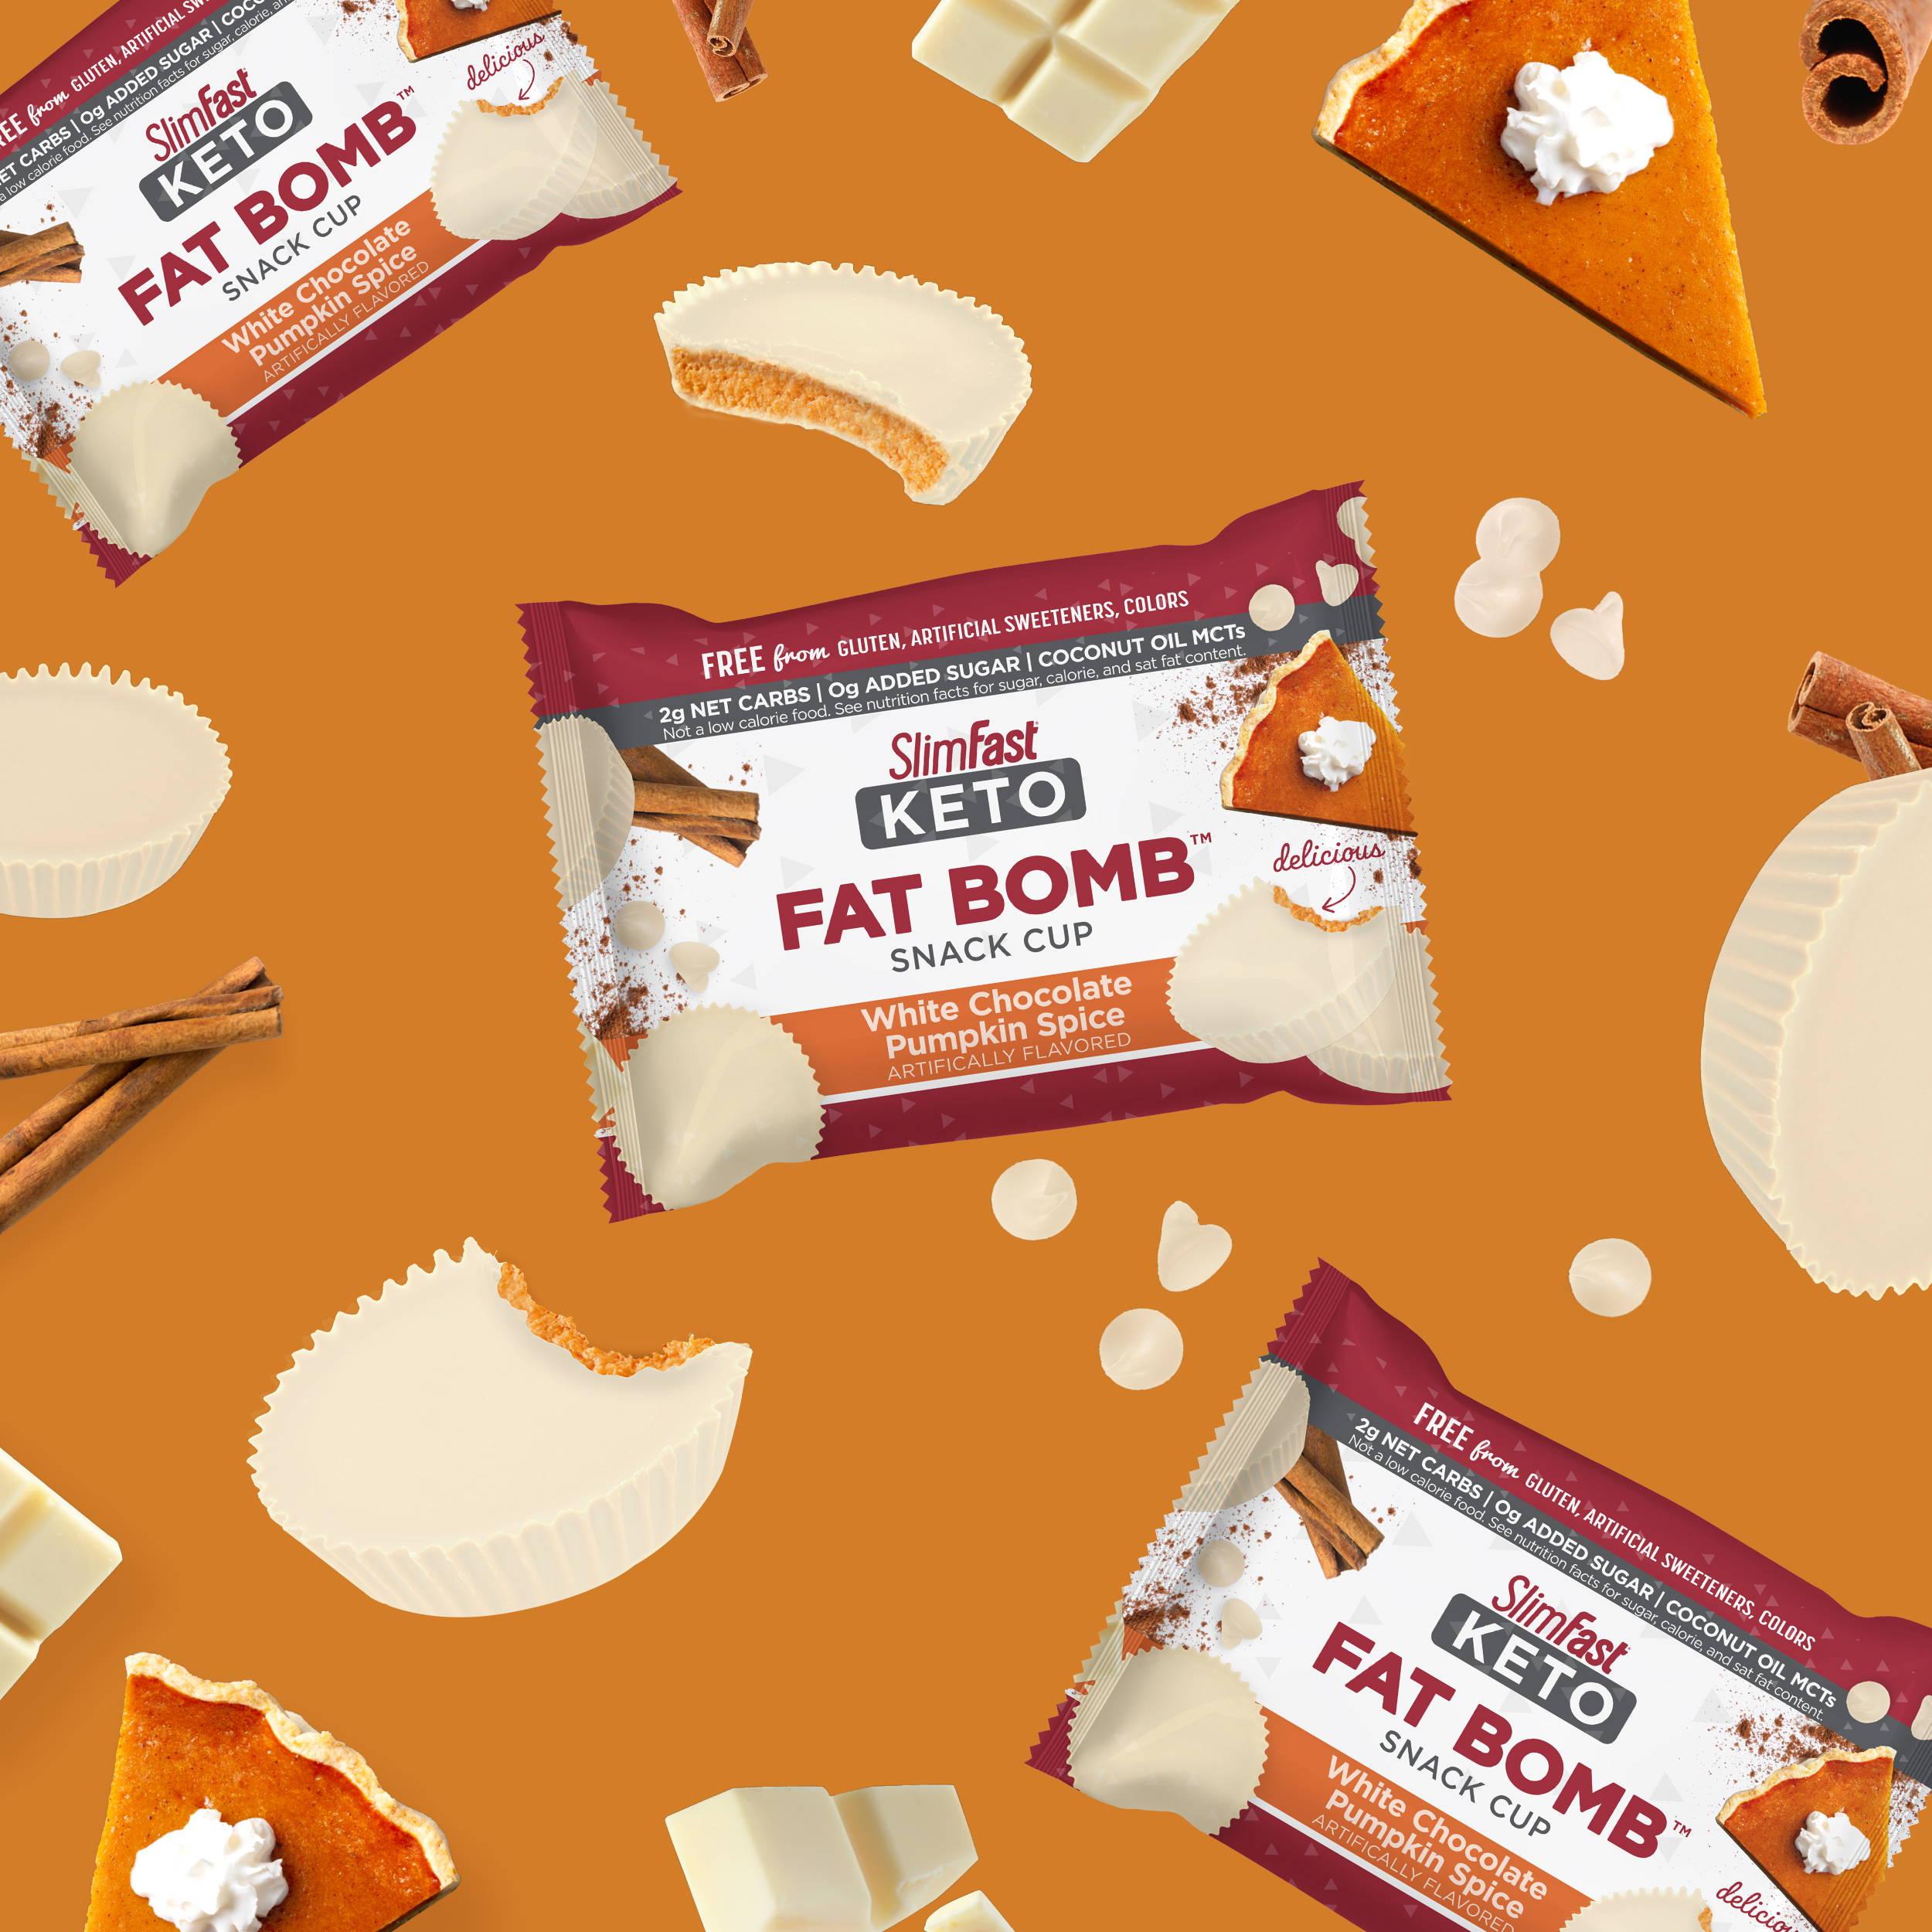 Keto Fat Bomb White Chocolate Pumpkin Spice  package